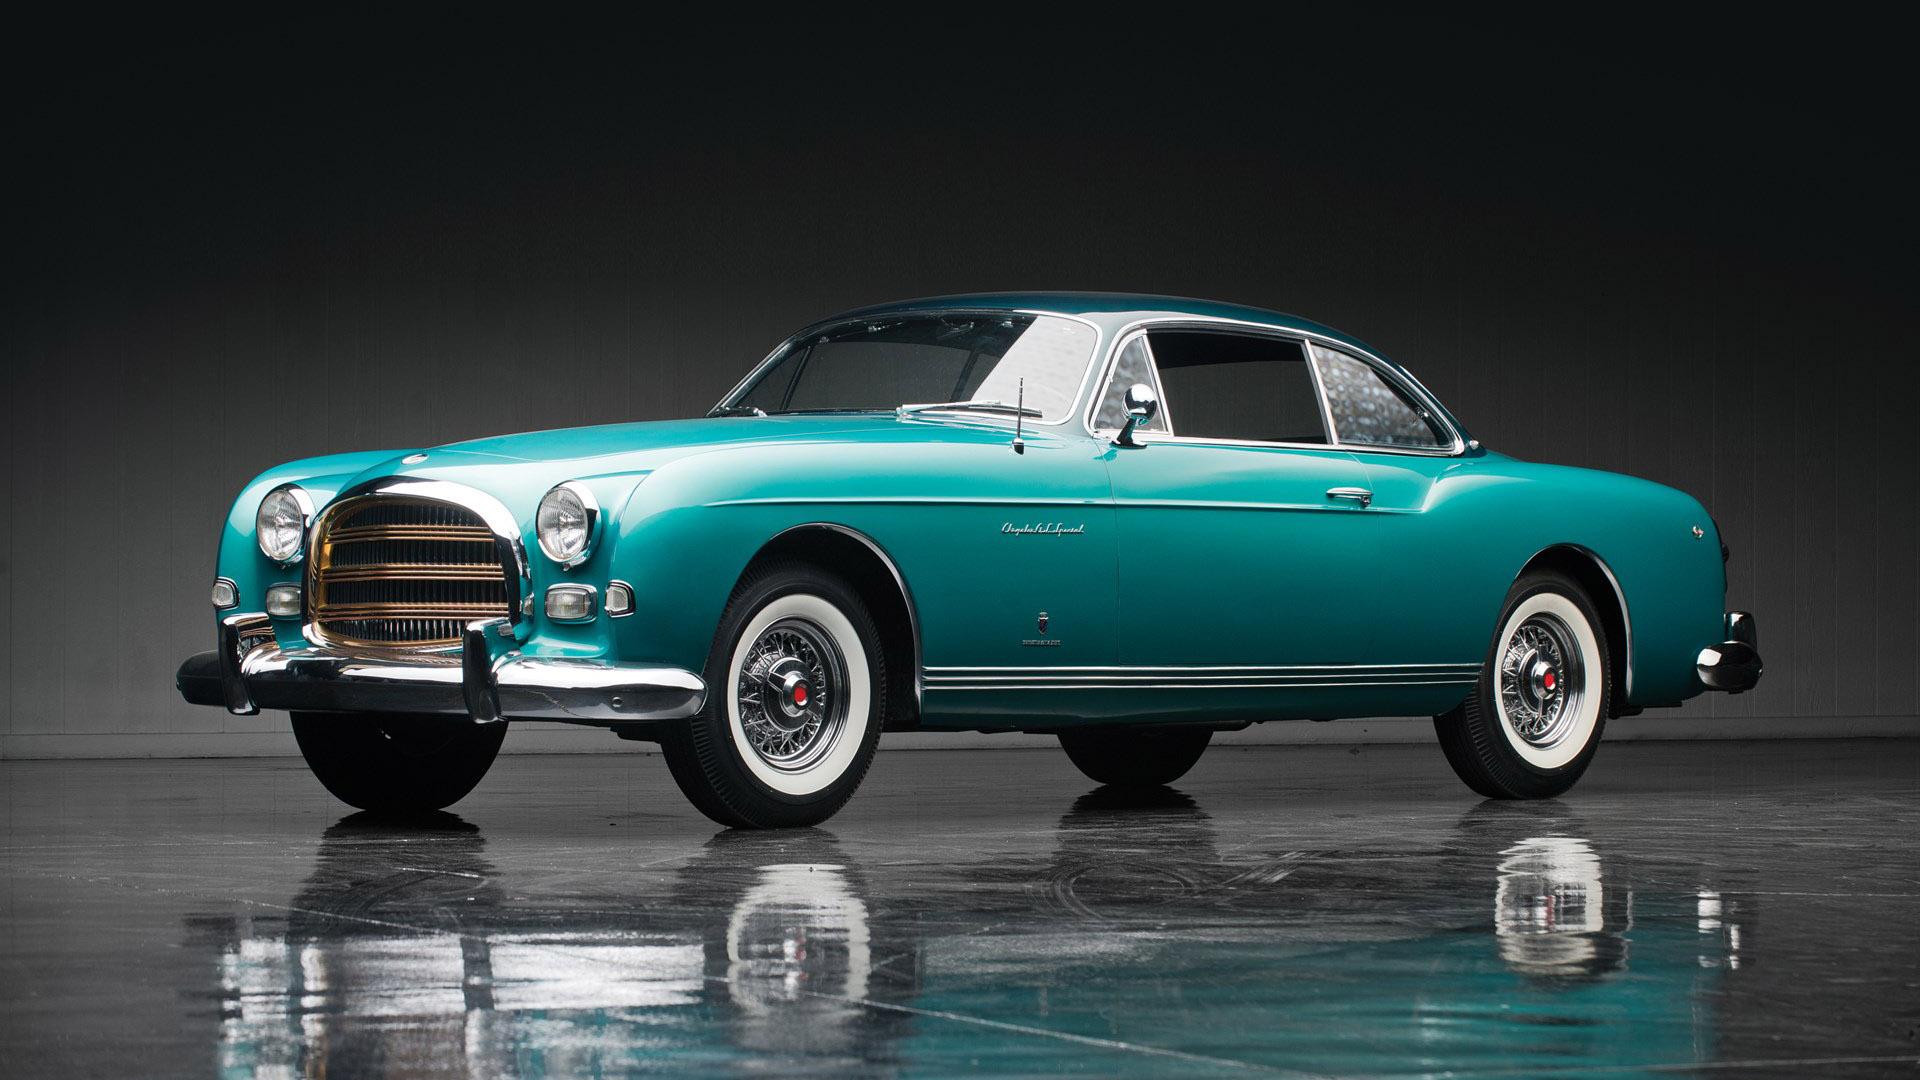 Coche del día: Chrysler GS-1 Special by Ghia